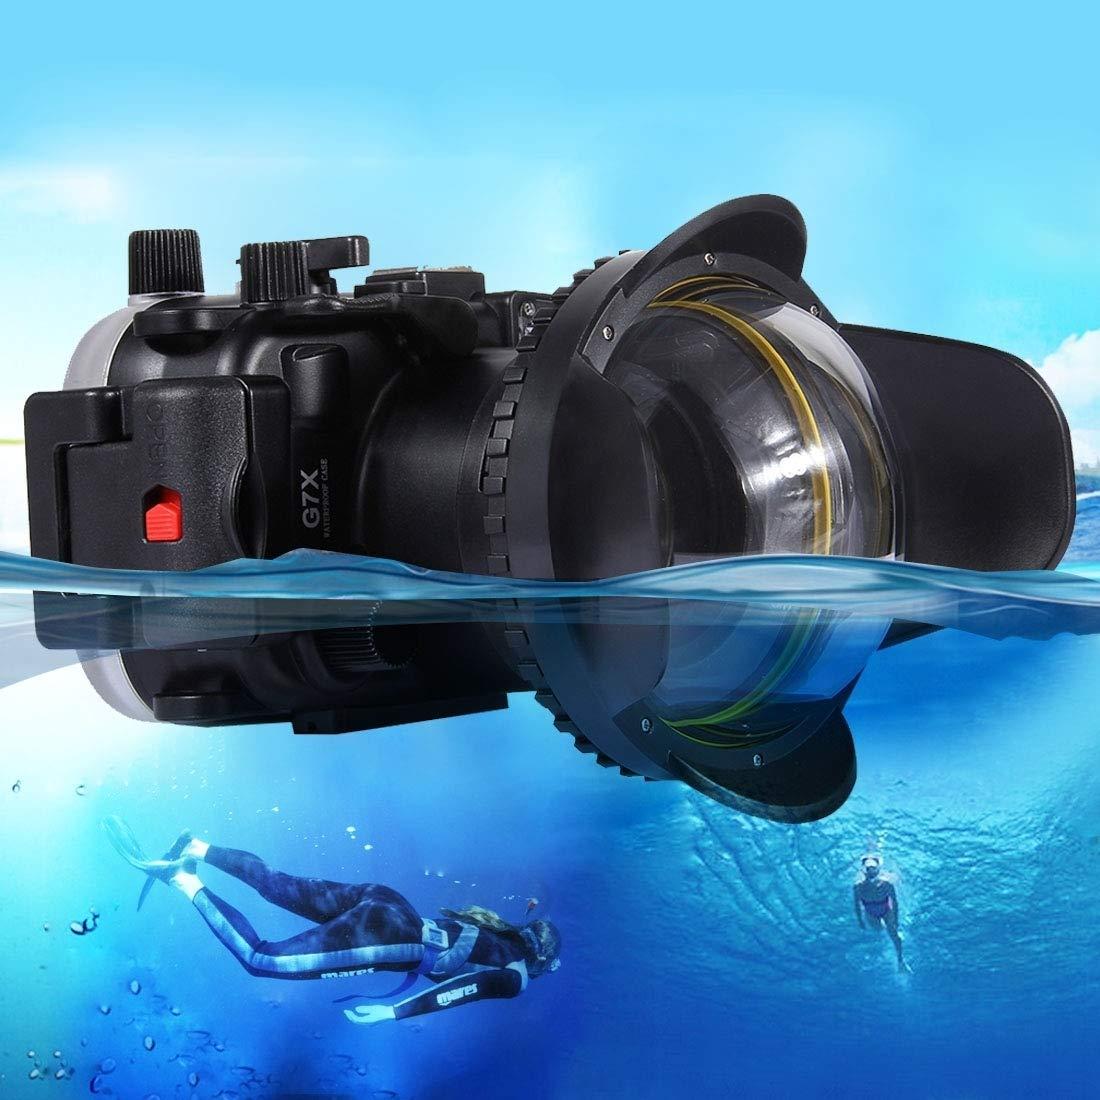 Dig 犬用骨 カメラアクセサリー 光学魚眼レンズシェード 広角ドームポートレンズ 水中ハウジングに対応 水中深度60m   B07L9Y37HM